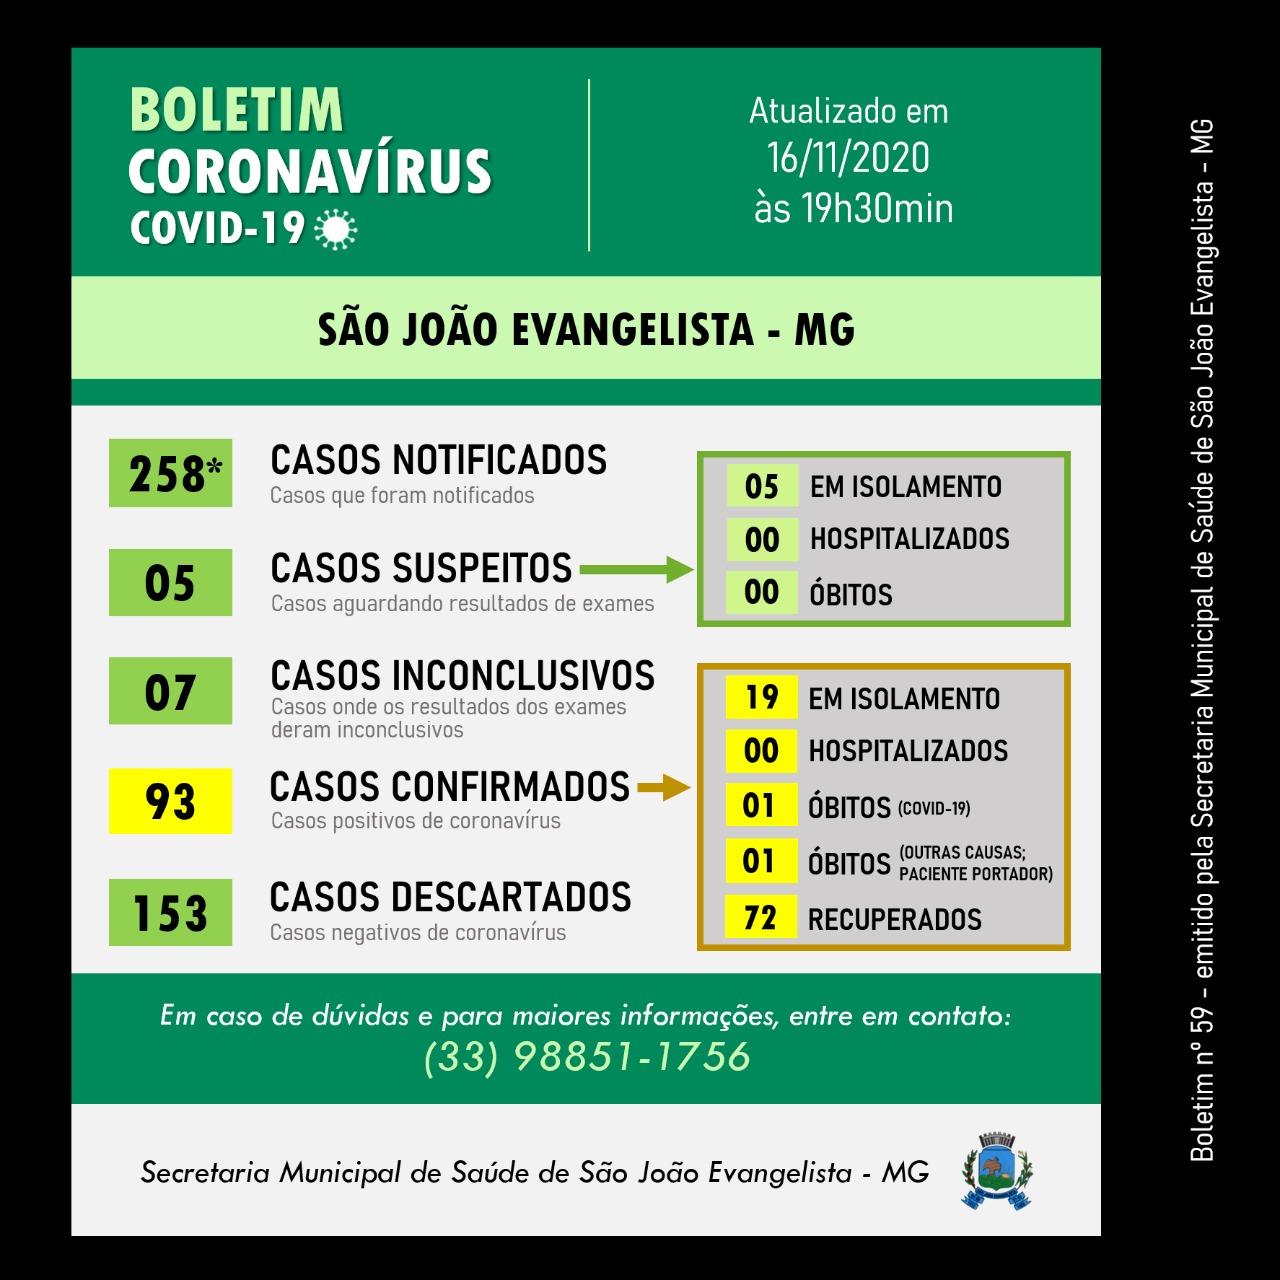 BOLETIM OFICIAL CORONAVÍRUS 16 DE NOVEMBRO DE 2020